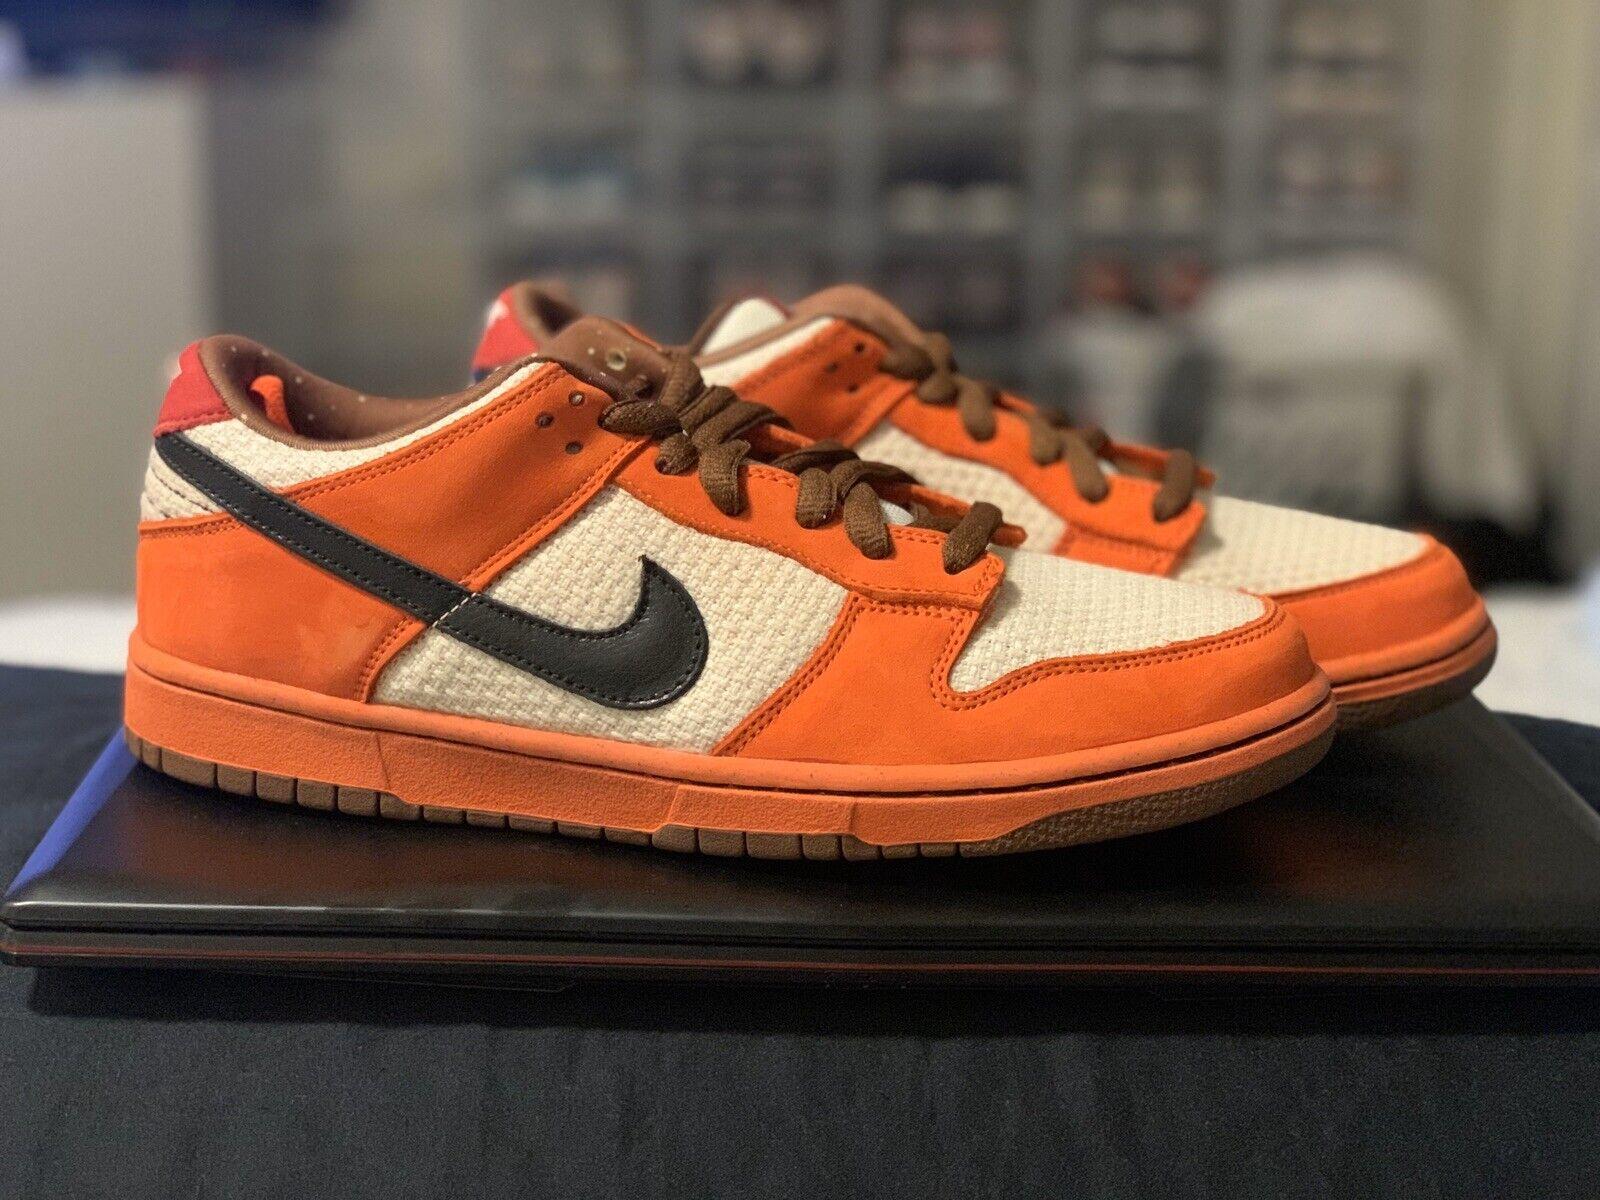 Nike SB Dunk Low Ramen Un Hemp Orange